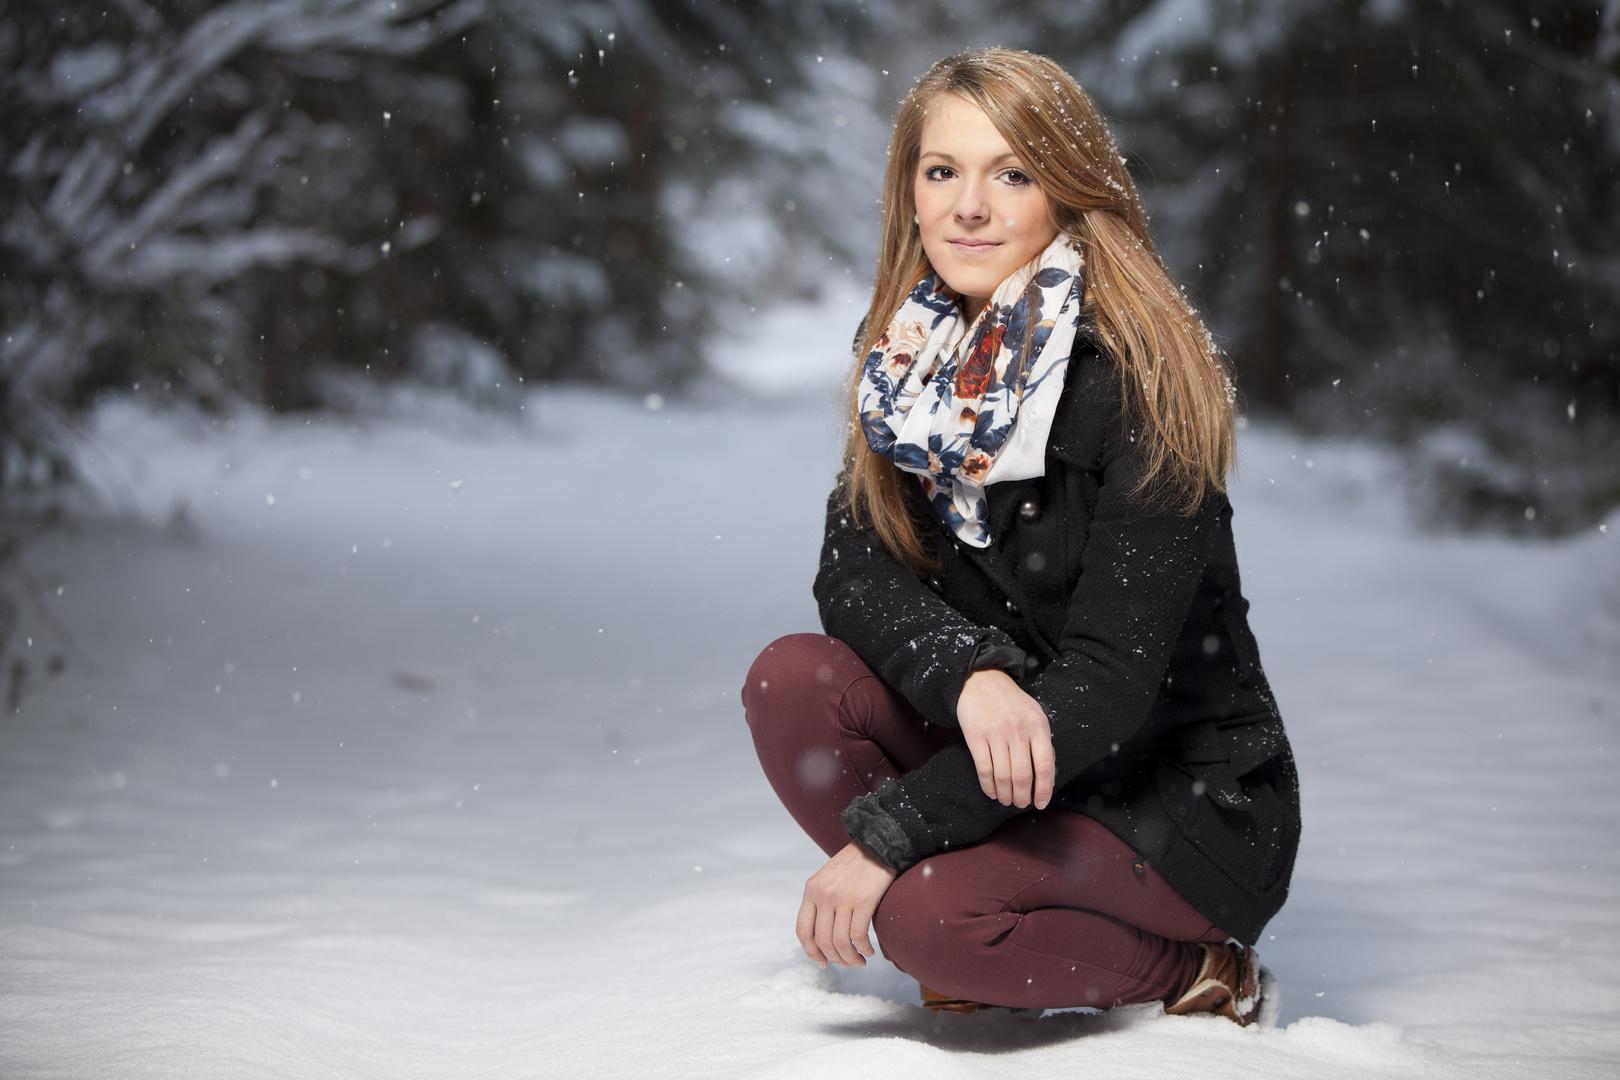 Lena im Schnee . . .